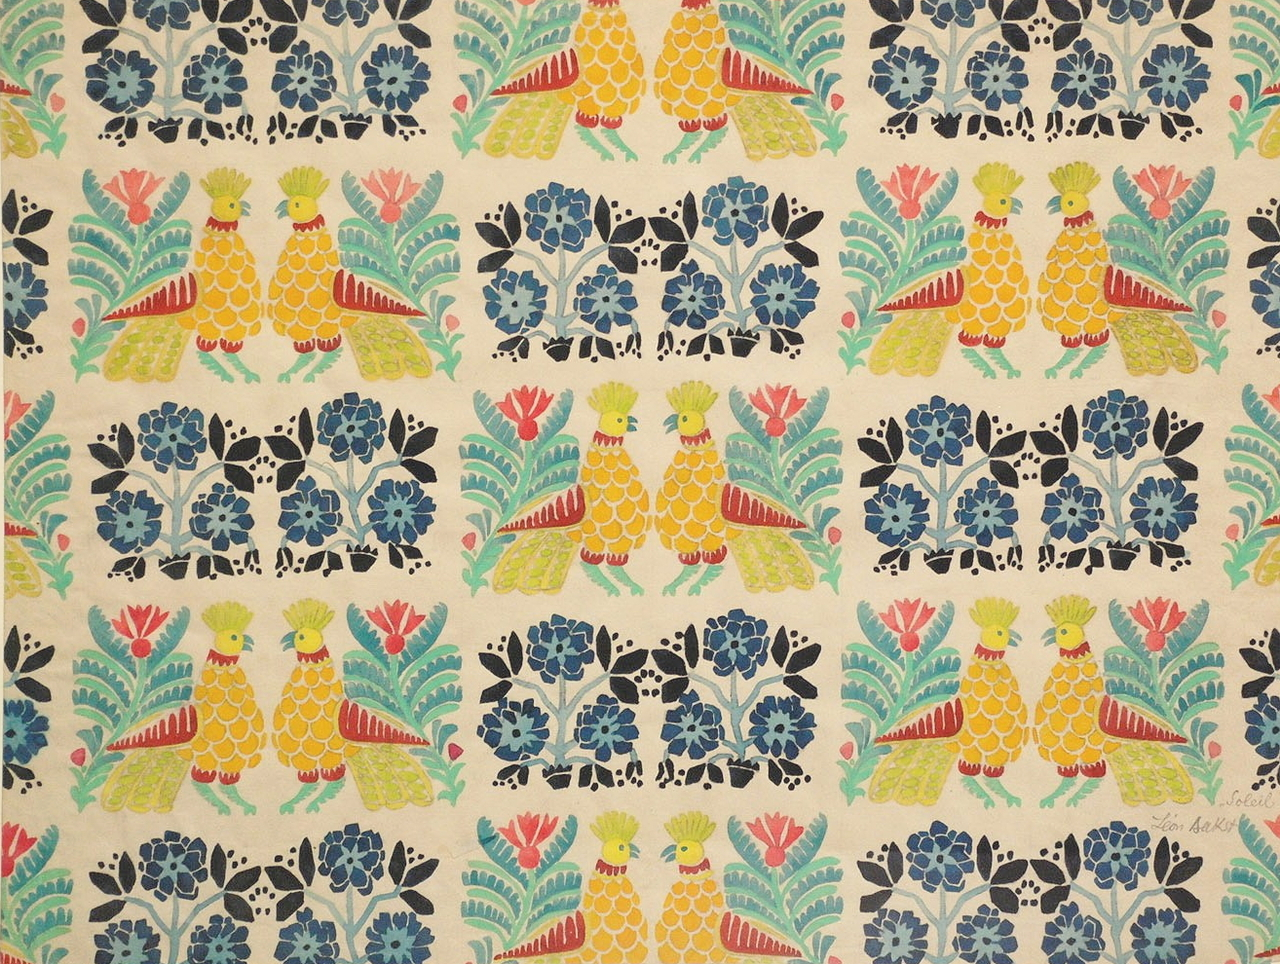 cavetocanvas: Léon Bakst, Textile Print, c. 1922